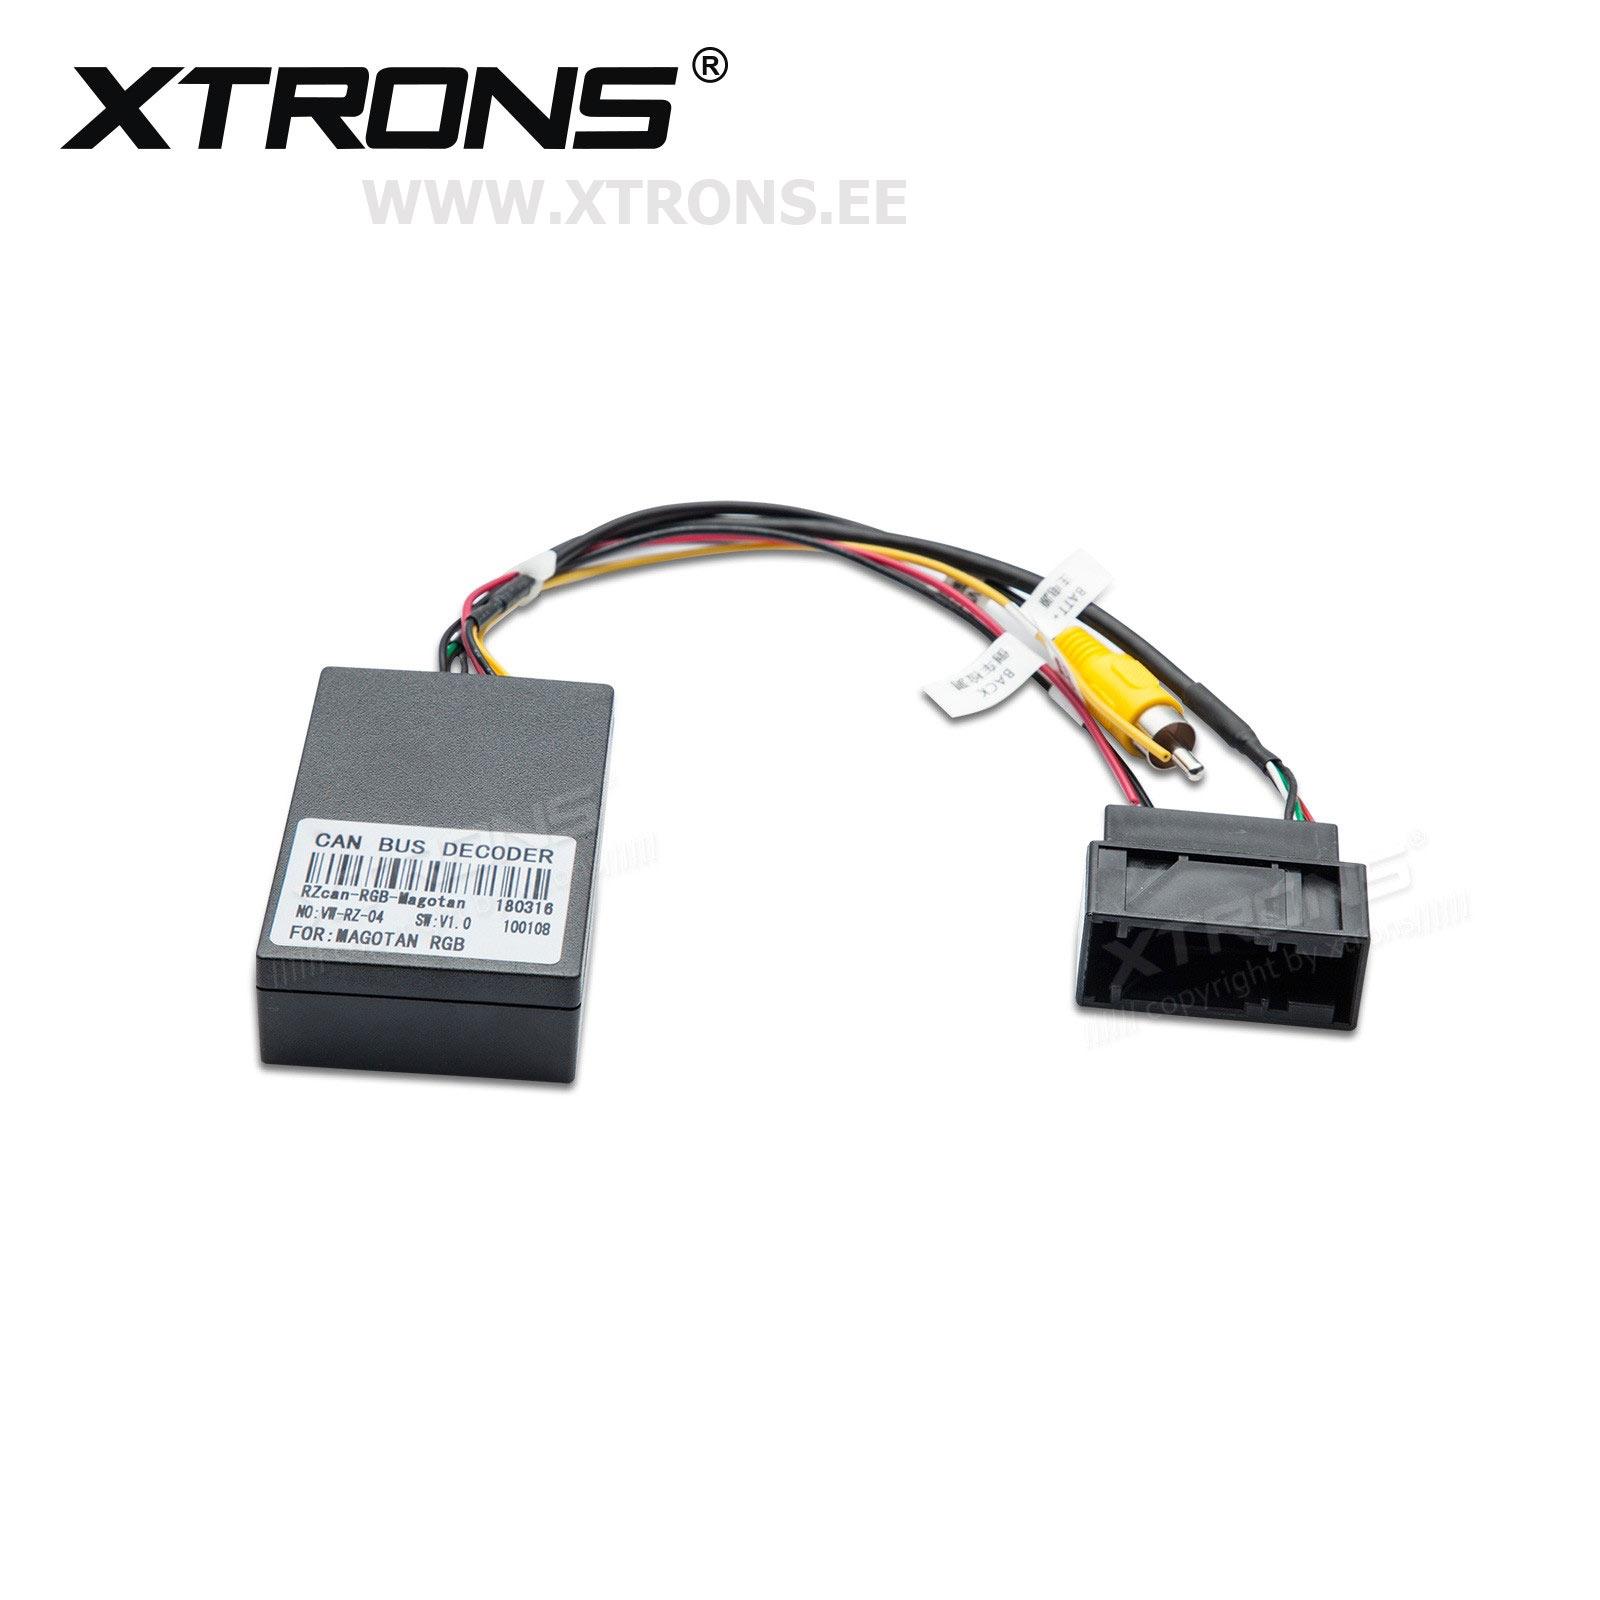 XTRONS CAMDCV02